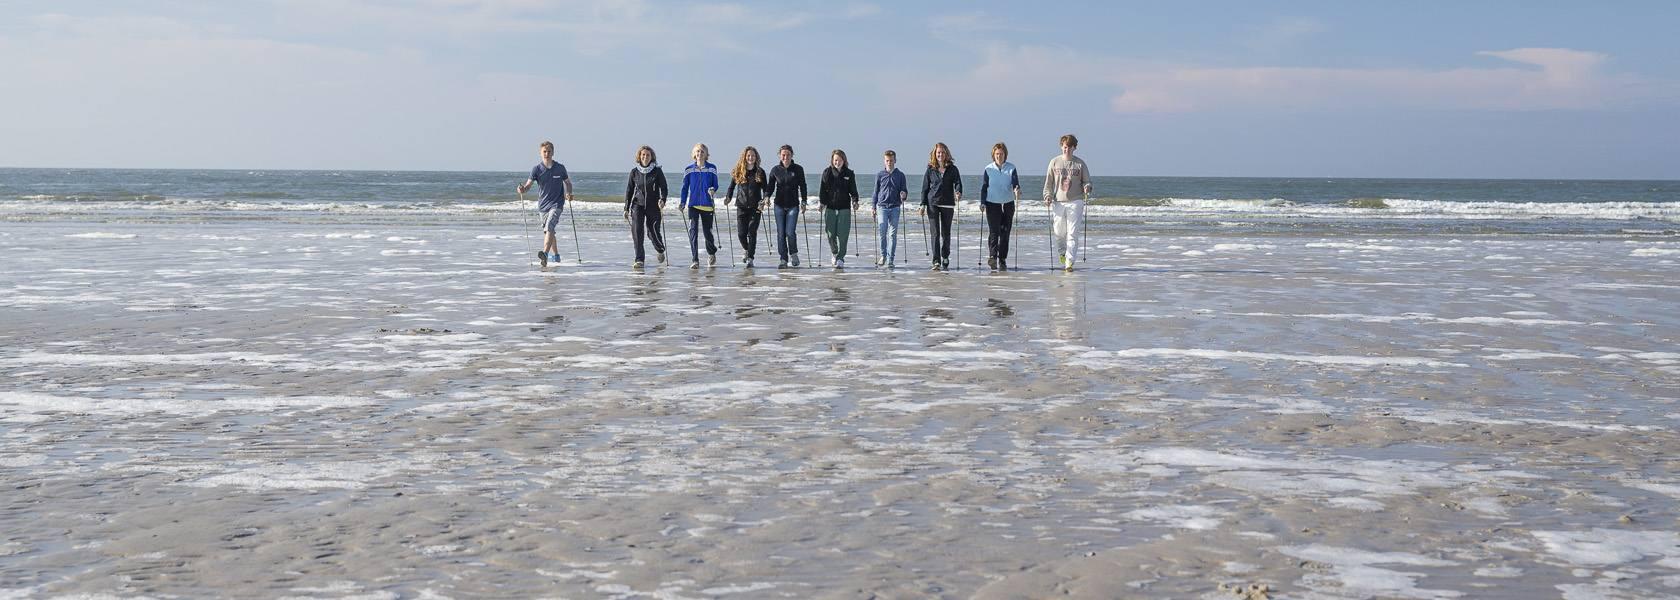 Nordic Walking im Watt, © Die Nordsee GmbH, Martin Stöver